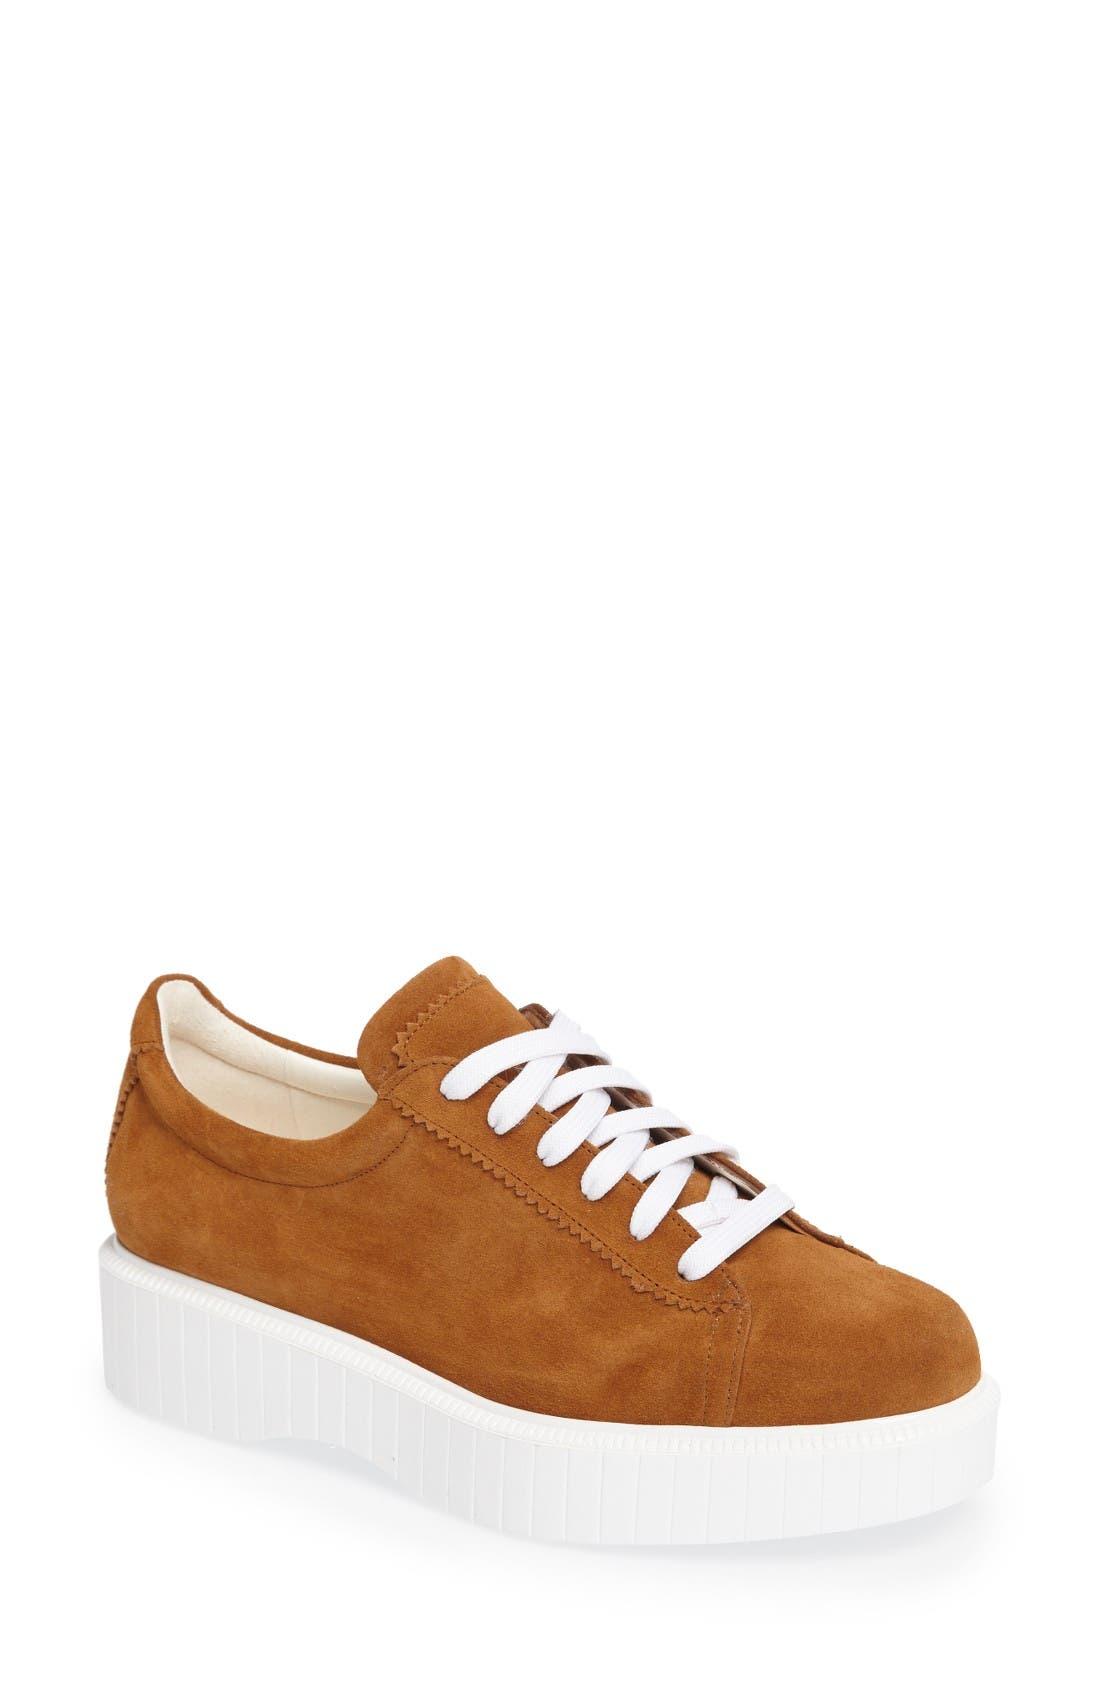 ROBERT CLERGERIE Pasketm Sneaker